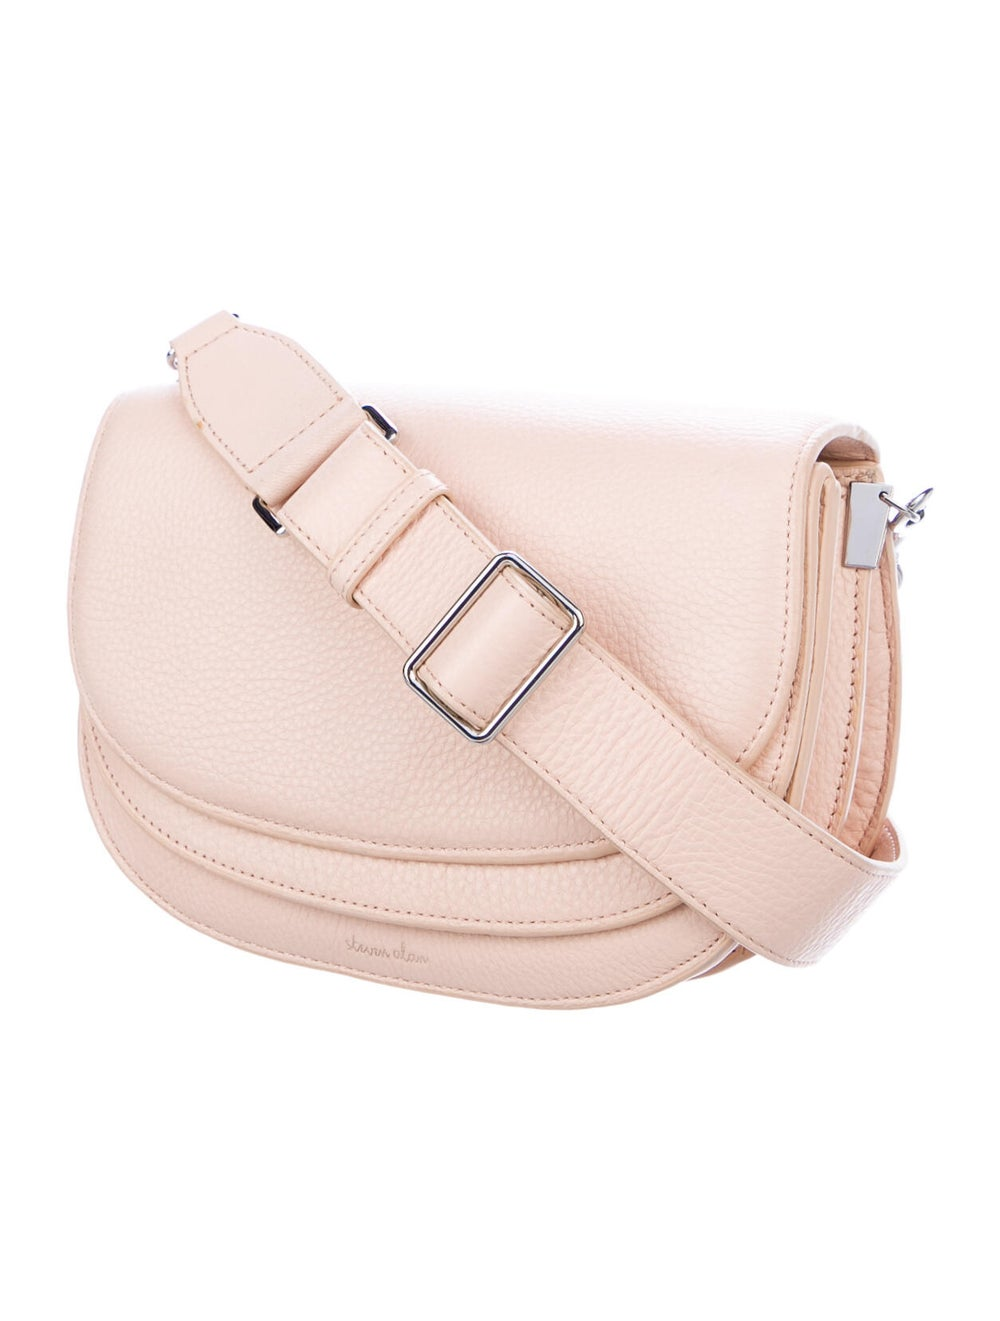 Steven Alan Leather Crossbody Bag Pink - image 3